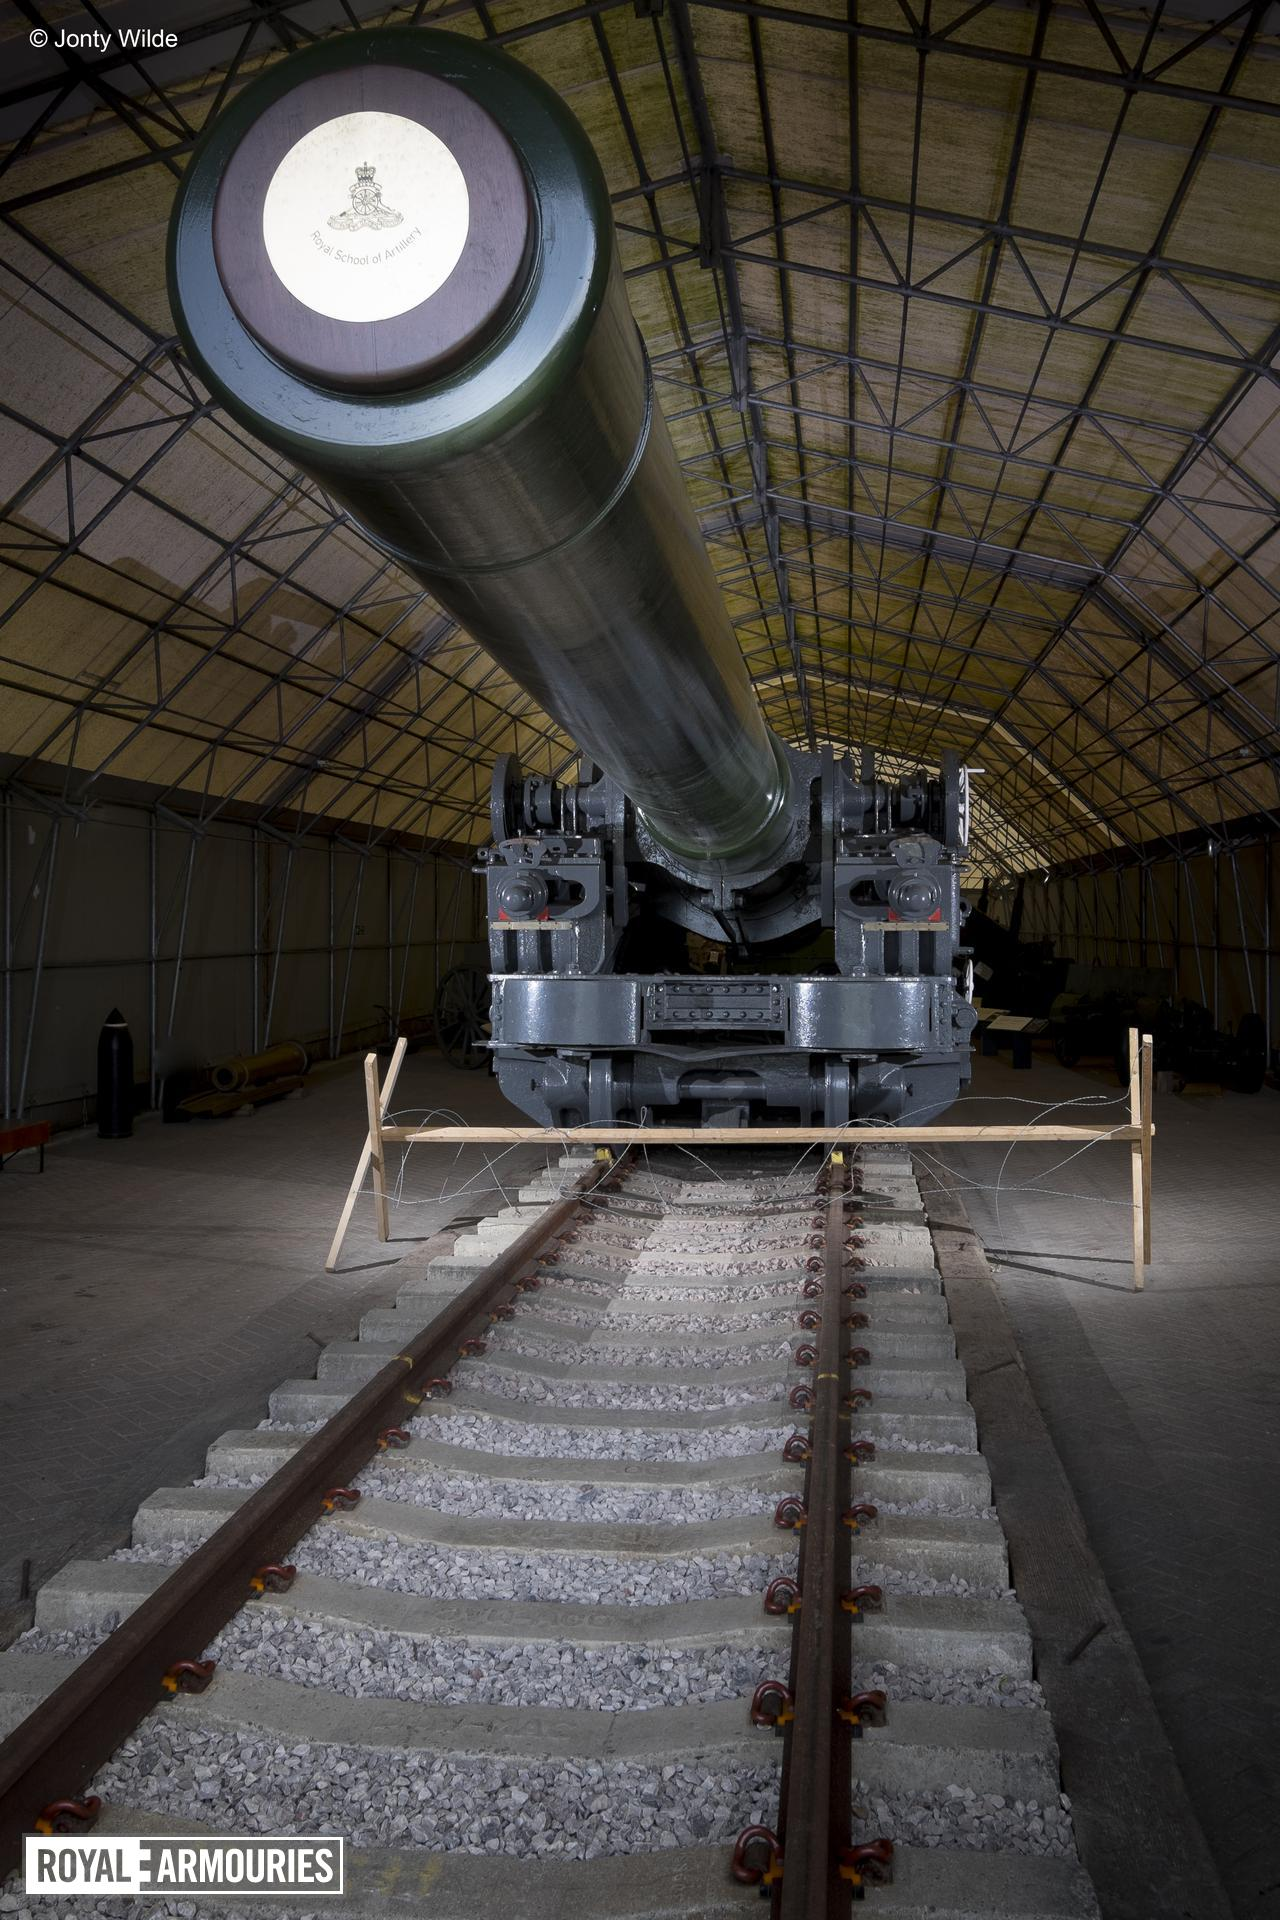 18 inch breech loading railway howitzer - on loan from the Royal Artillery Historical Trust, 1918, Britain (AL.387) © Jonty Wilde / By kind permission of the Royal Artillery Historical Trust